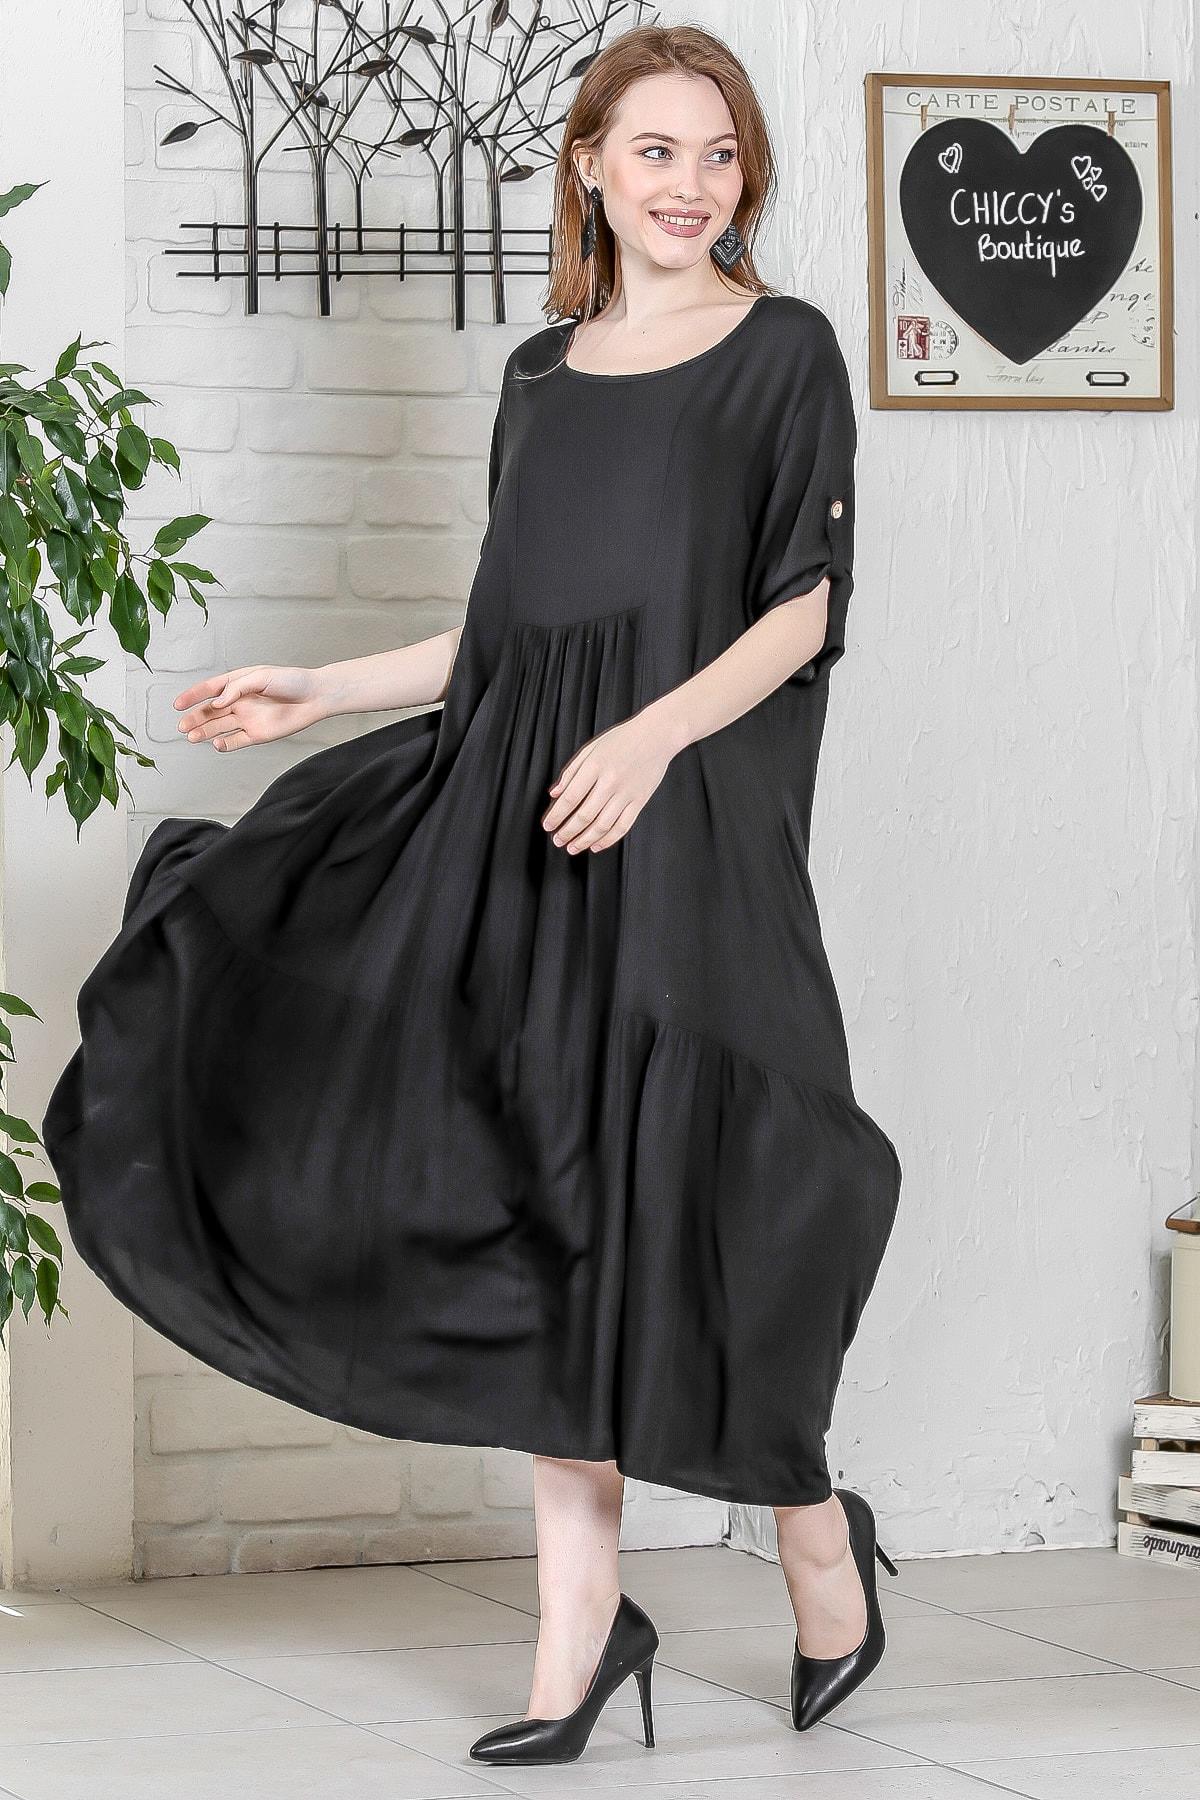 Chiccy Kadın Siyah Sıfır Yaka Ayarlanabilir Kol Detaylı Salaş Dokuma Uzun Elbise M10160000EL95222